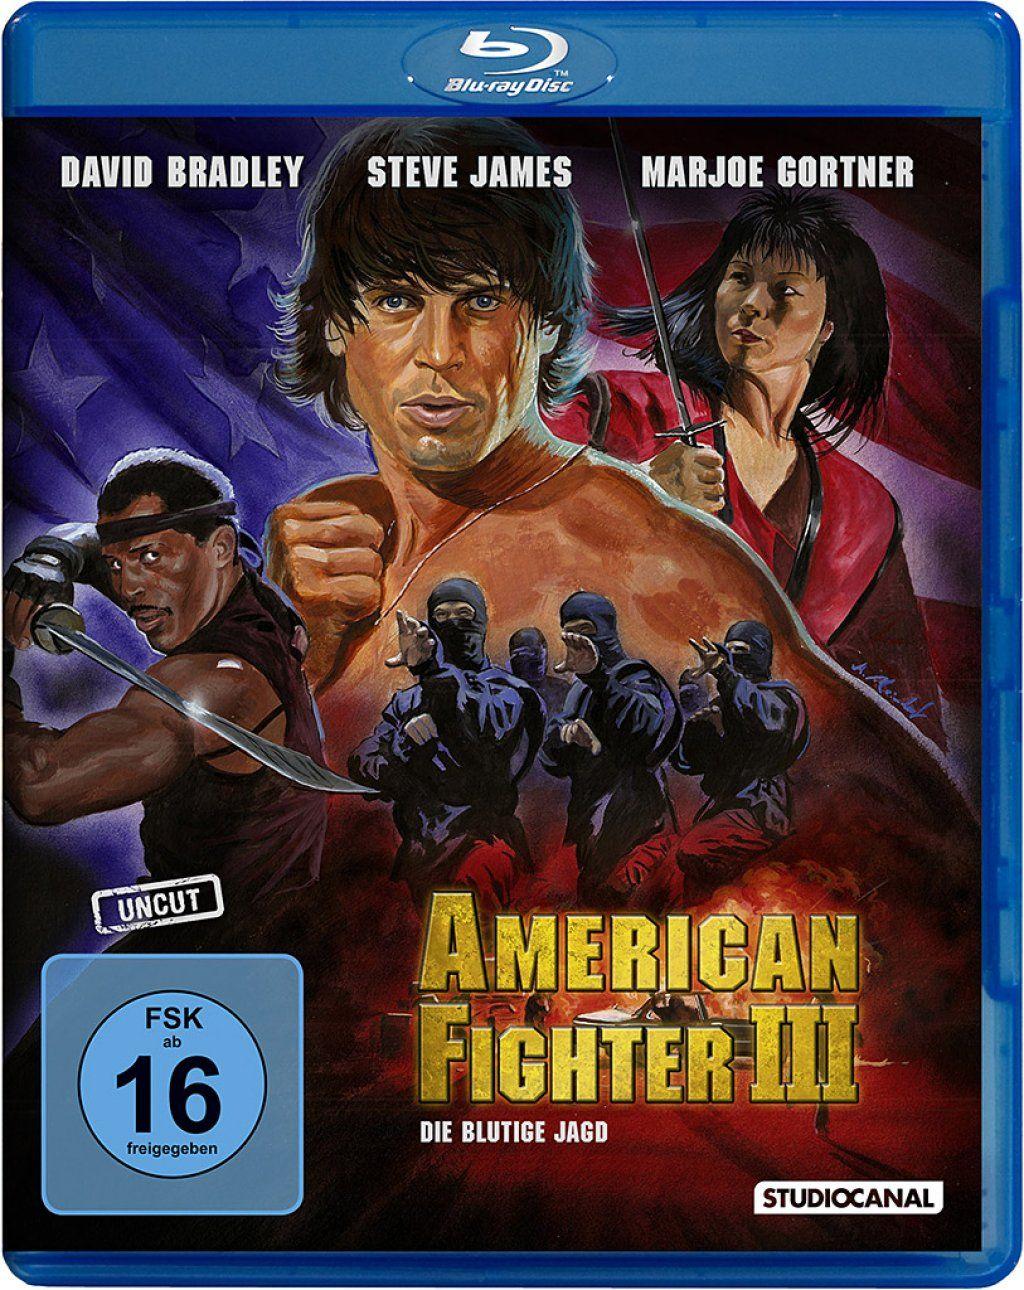 American Fighter 3: Die blutige Jagd (Uncut) (BLURAY)